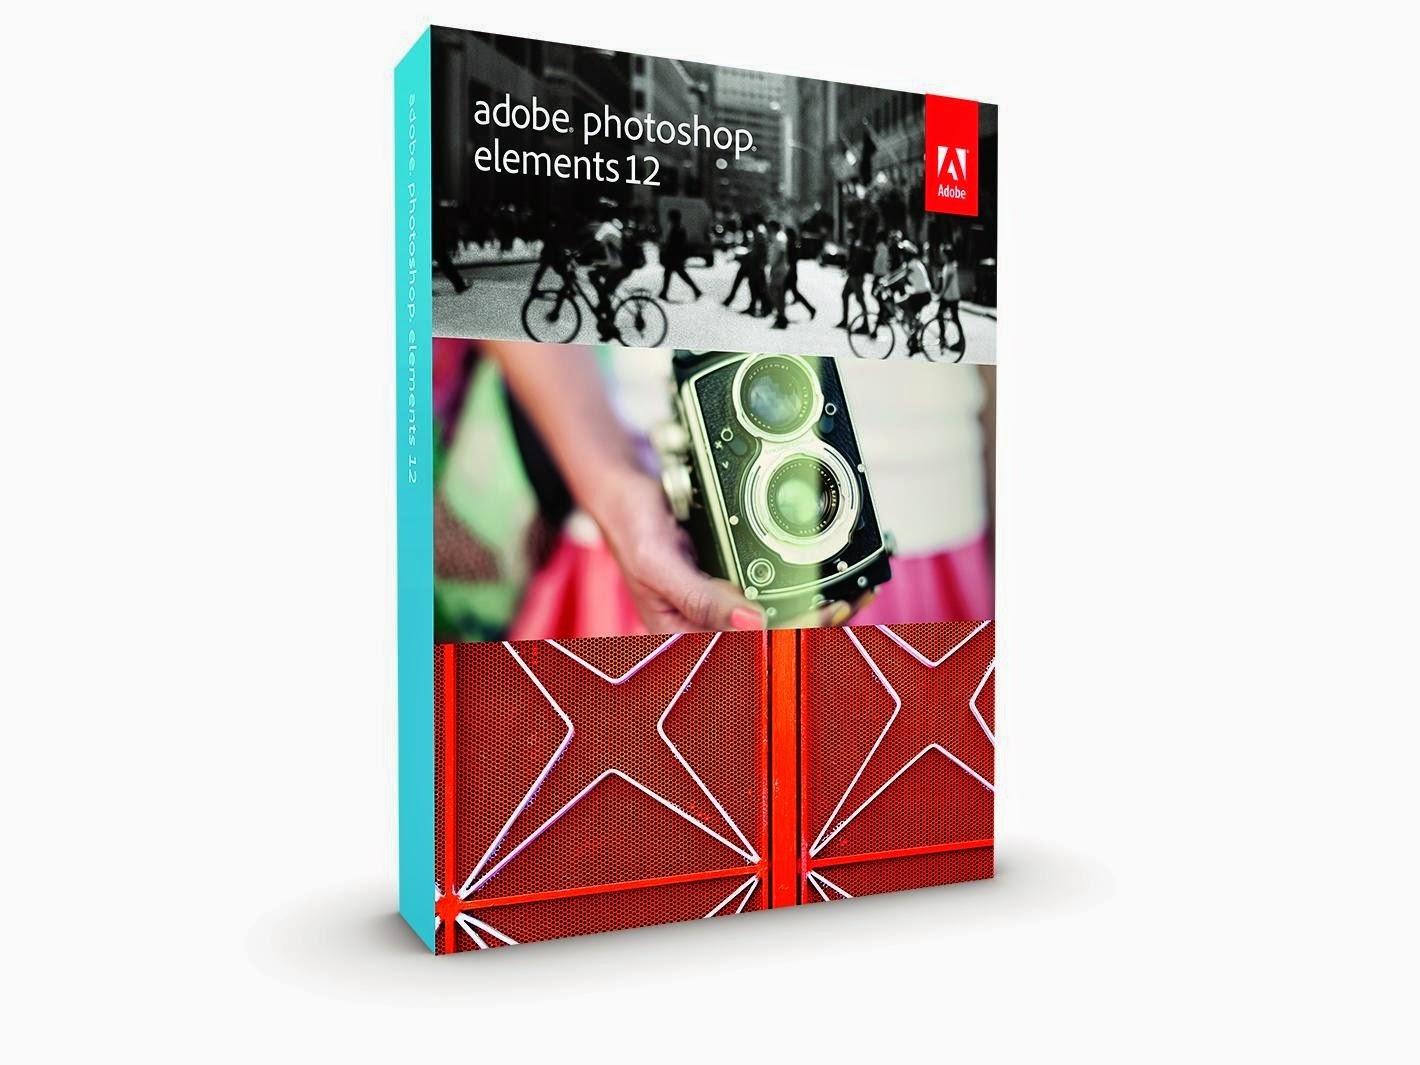 2015 adobe photoshop elements 12 serial key crack 2015 Adobe Photoshop Elements 12 Serial Key CRACK